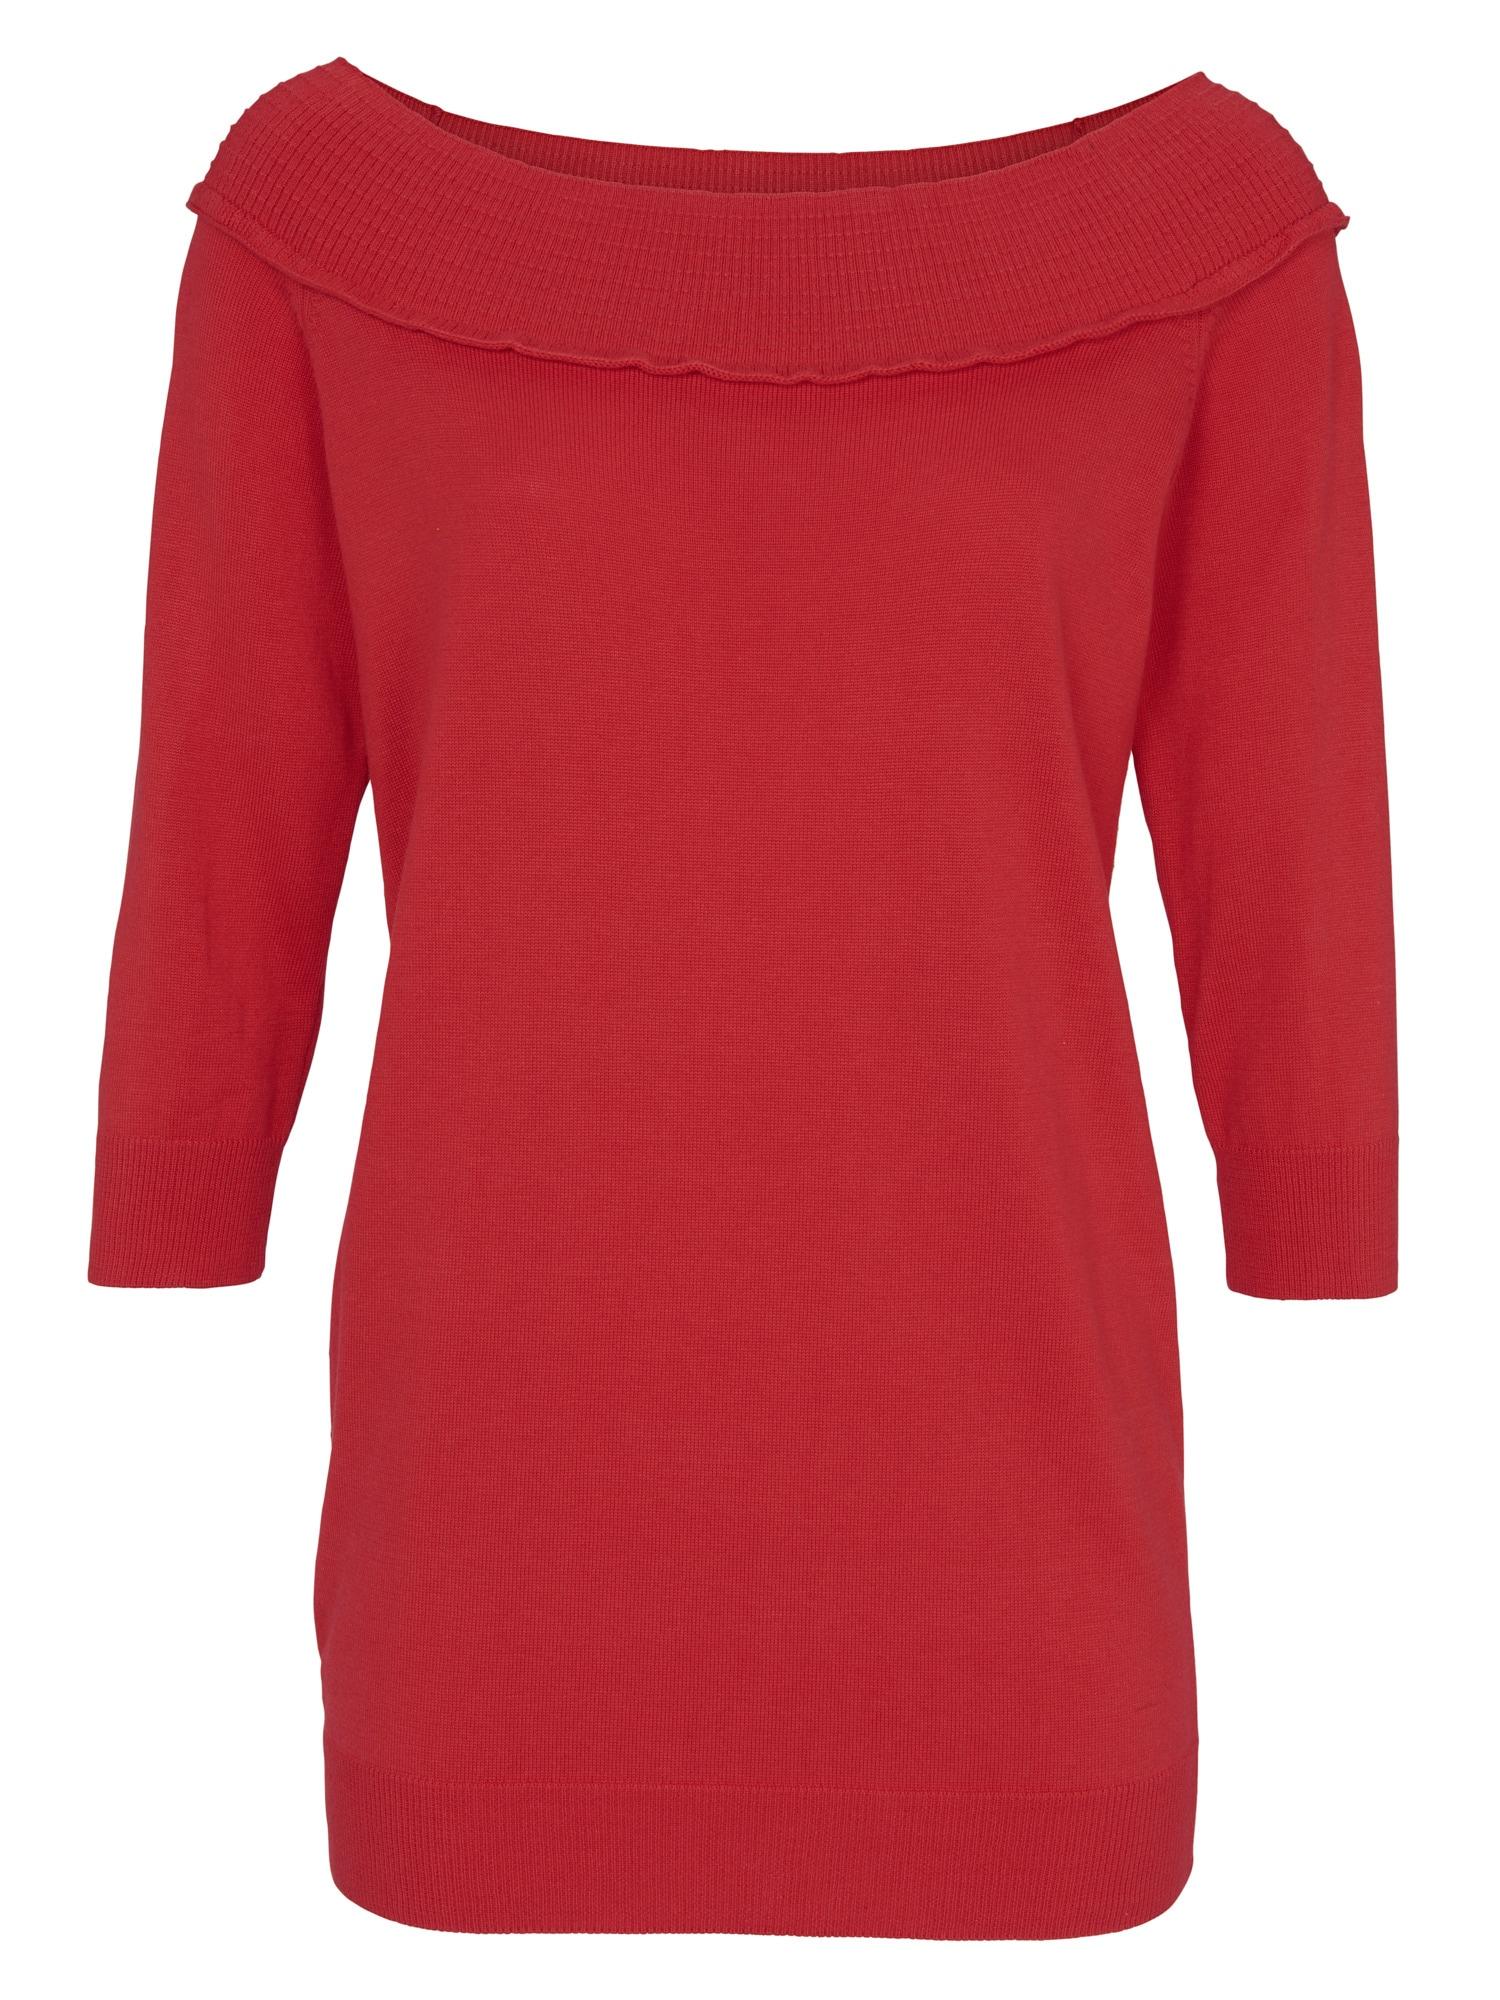 heine CASUAL Carmenpullover 3/4 Arm | Bekleidung > Pullover > Carmenpullover | Rot | Baumwolle | Heine Casual